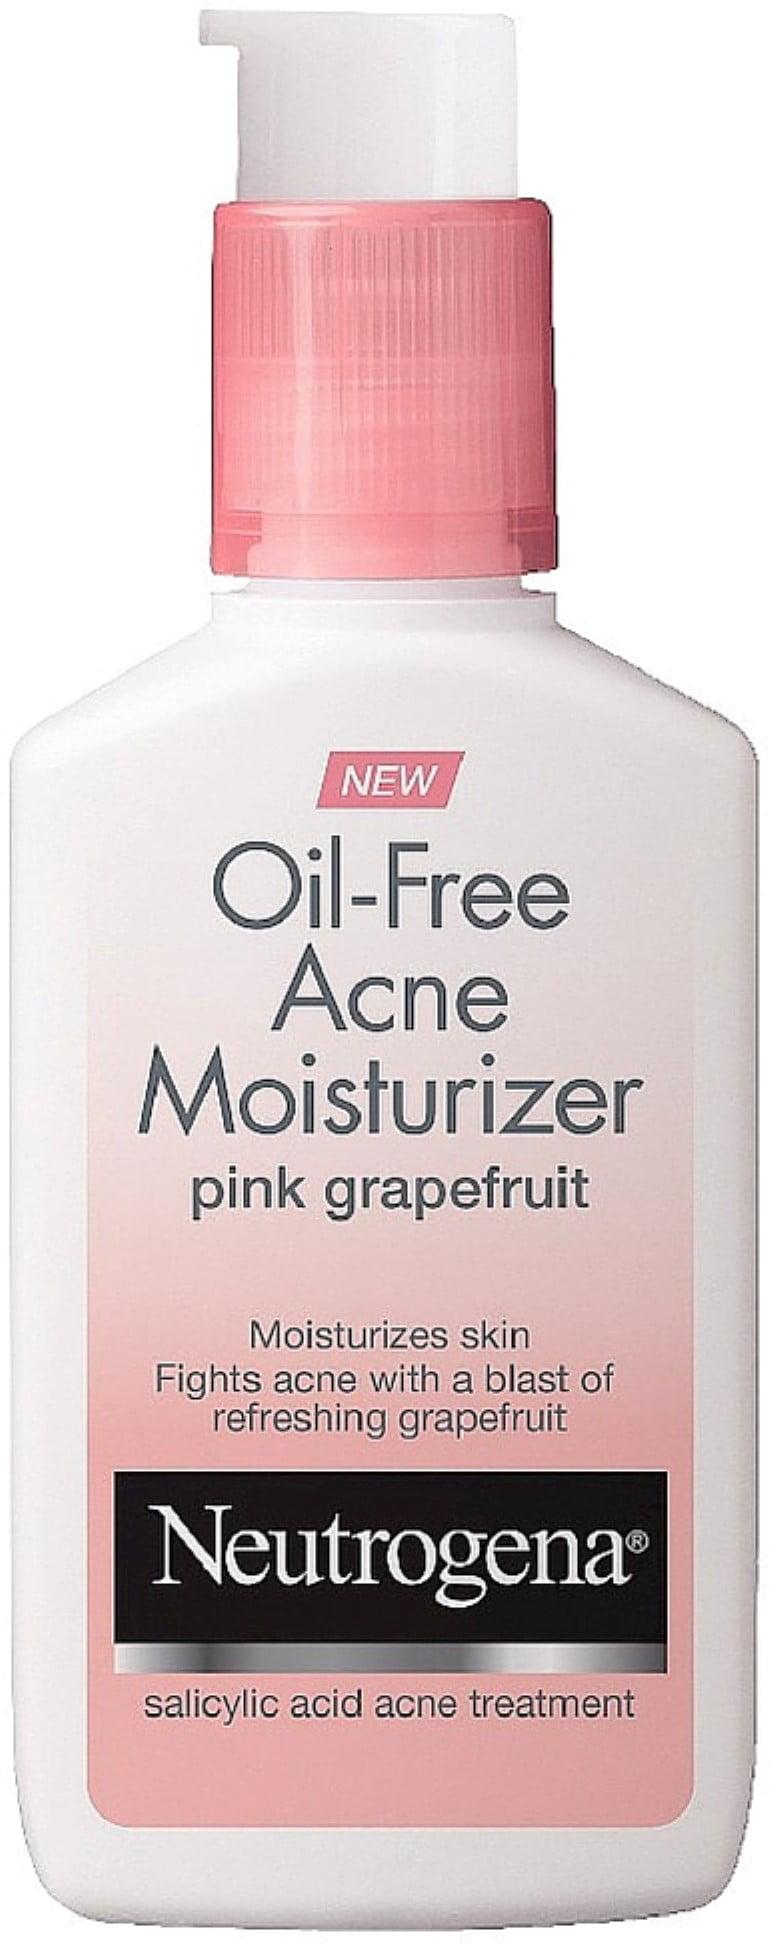 Neutrogena Oil-Free Acne Moisturizer, Pink Grapefruit 4 oz (Pack of 3) by